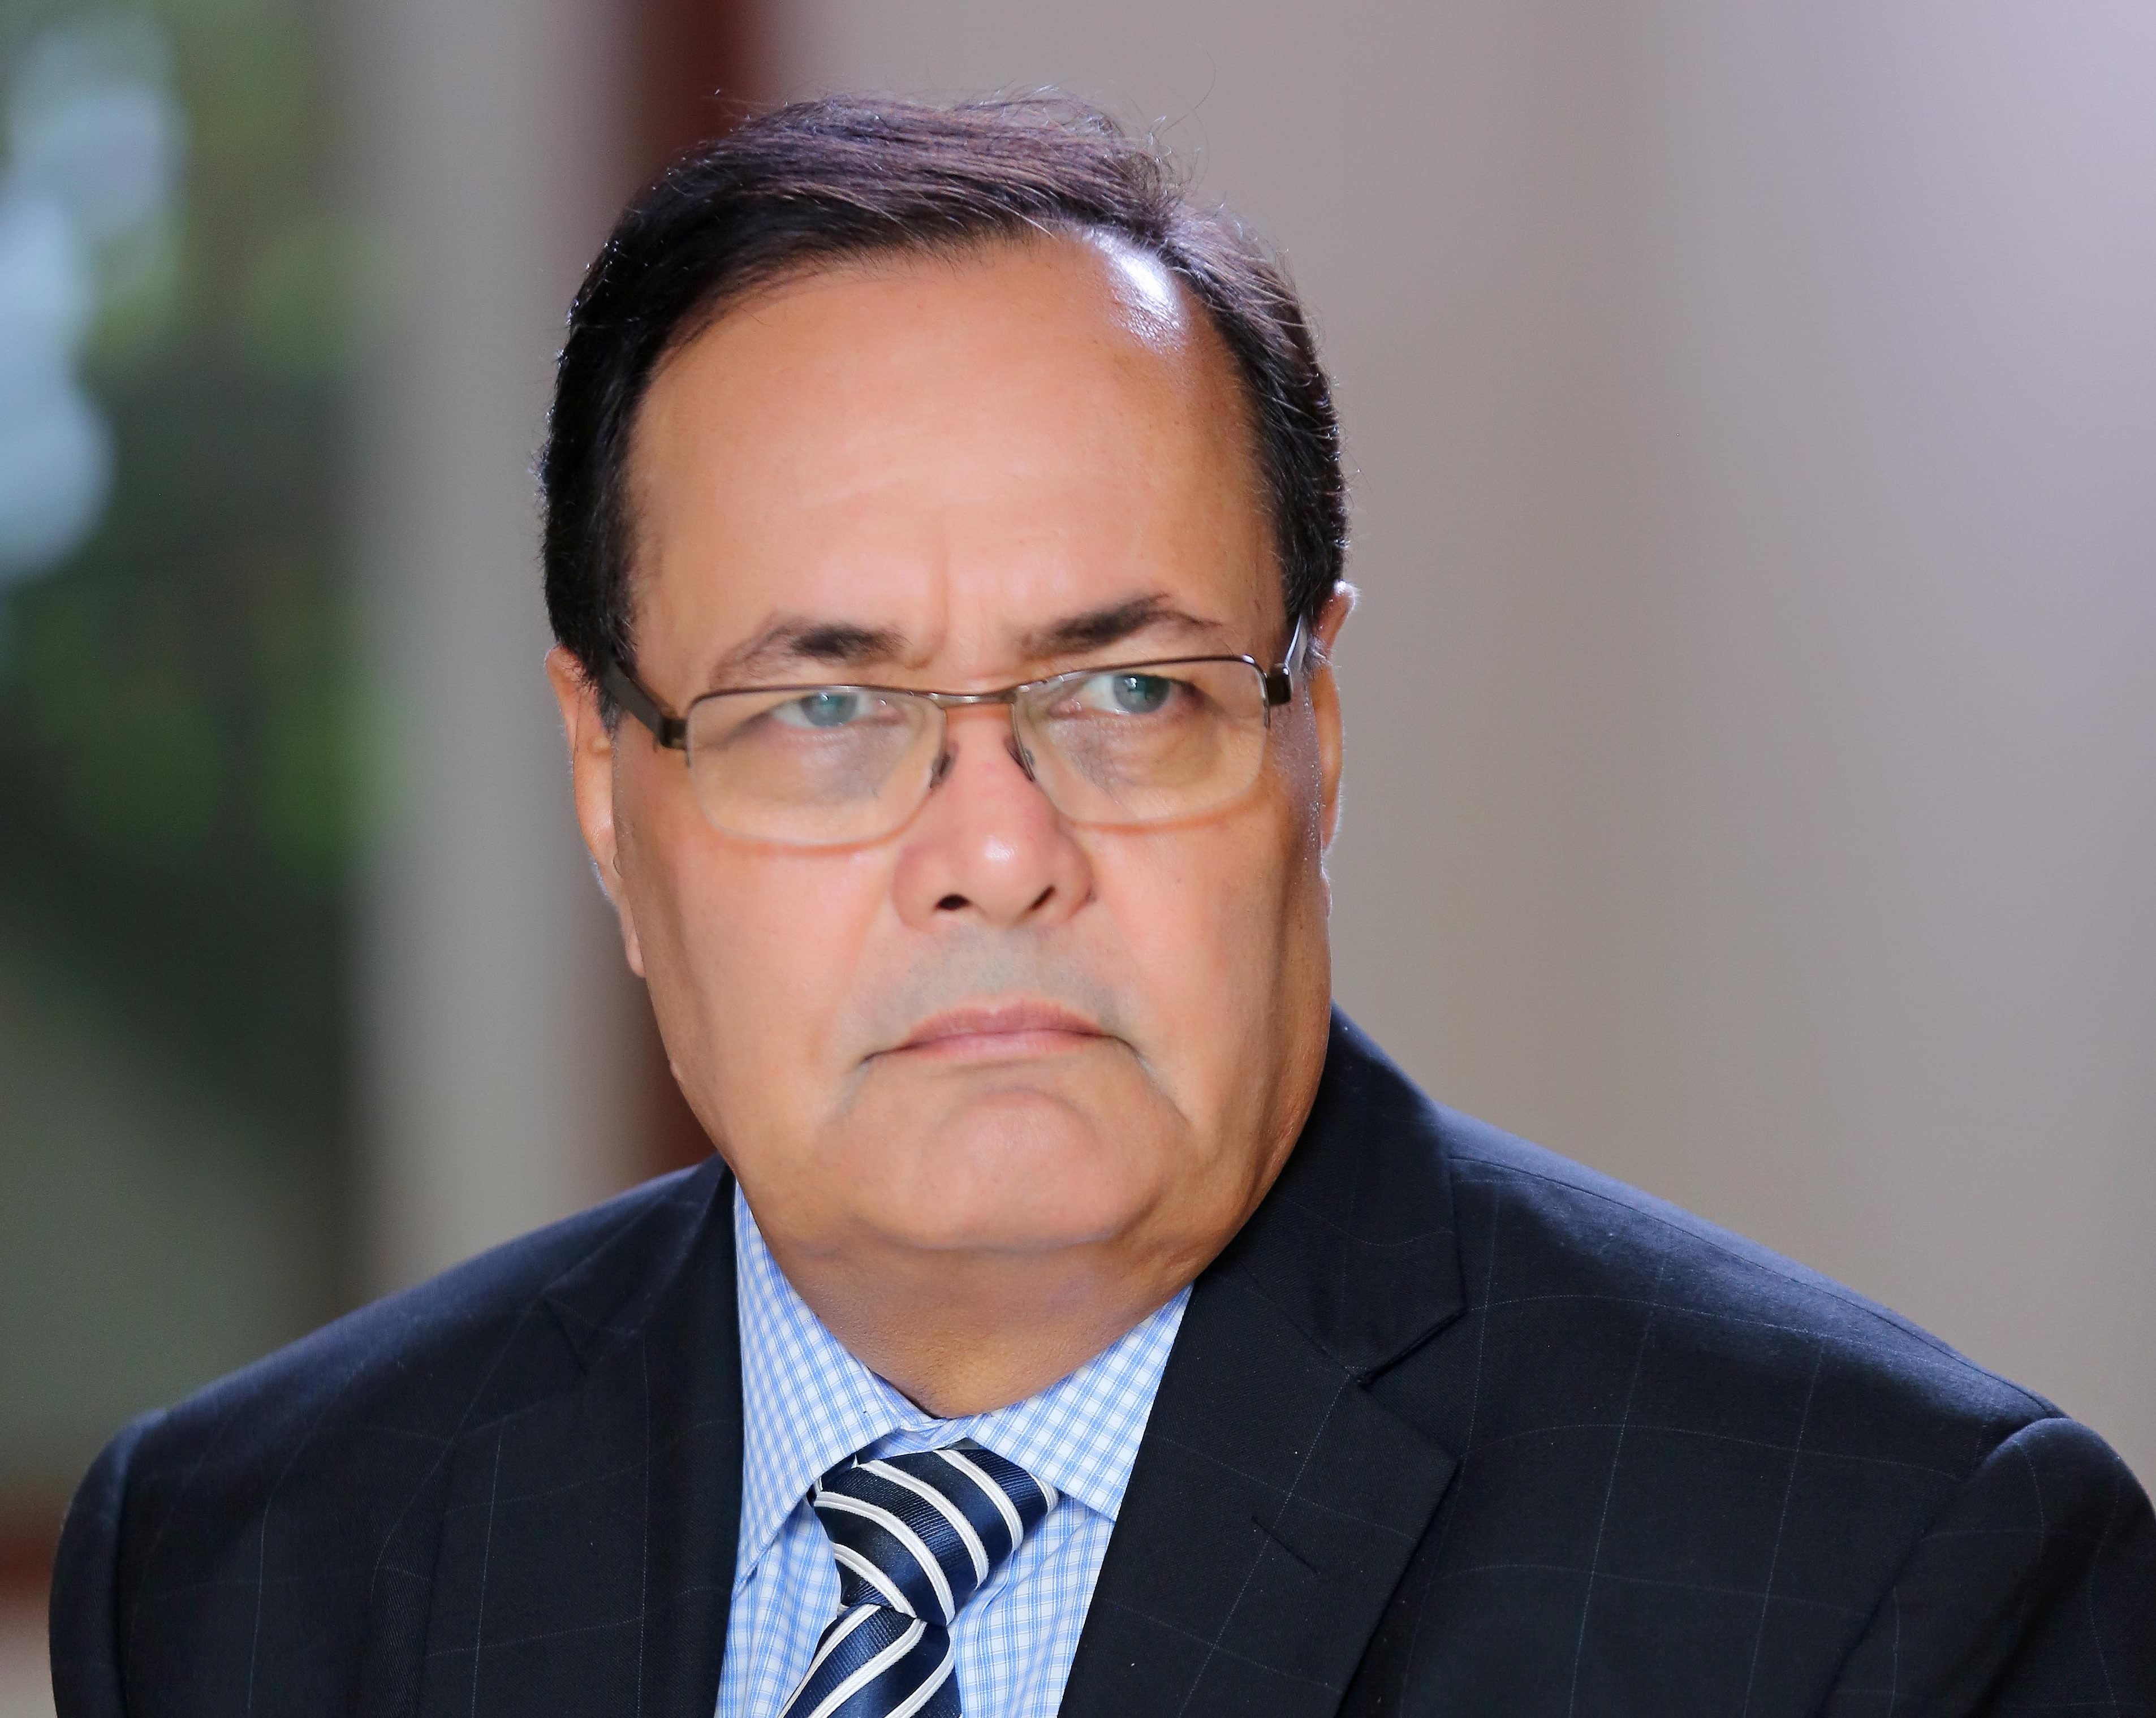 Dr. Syed <b>Sajjad Hussain</b> - Dr.-Syed-Sajjad-Hussain-1-e1463491591967